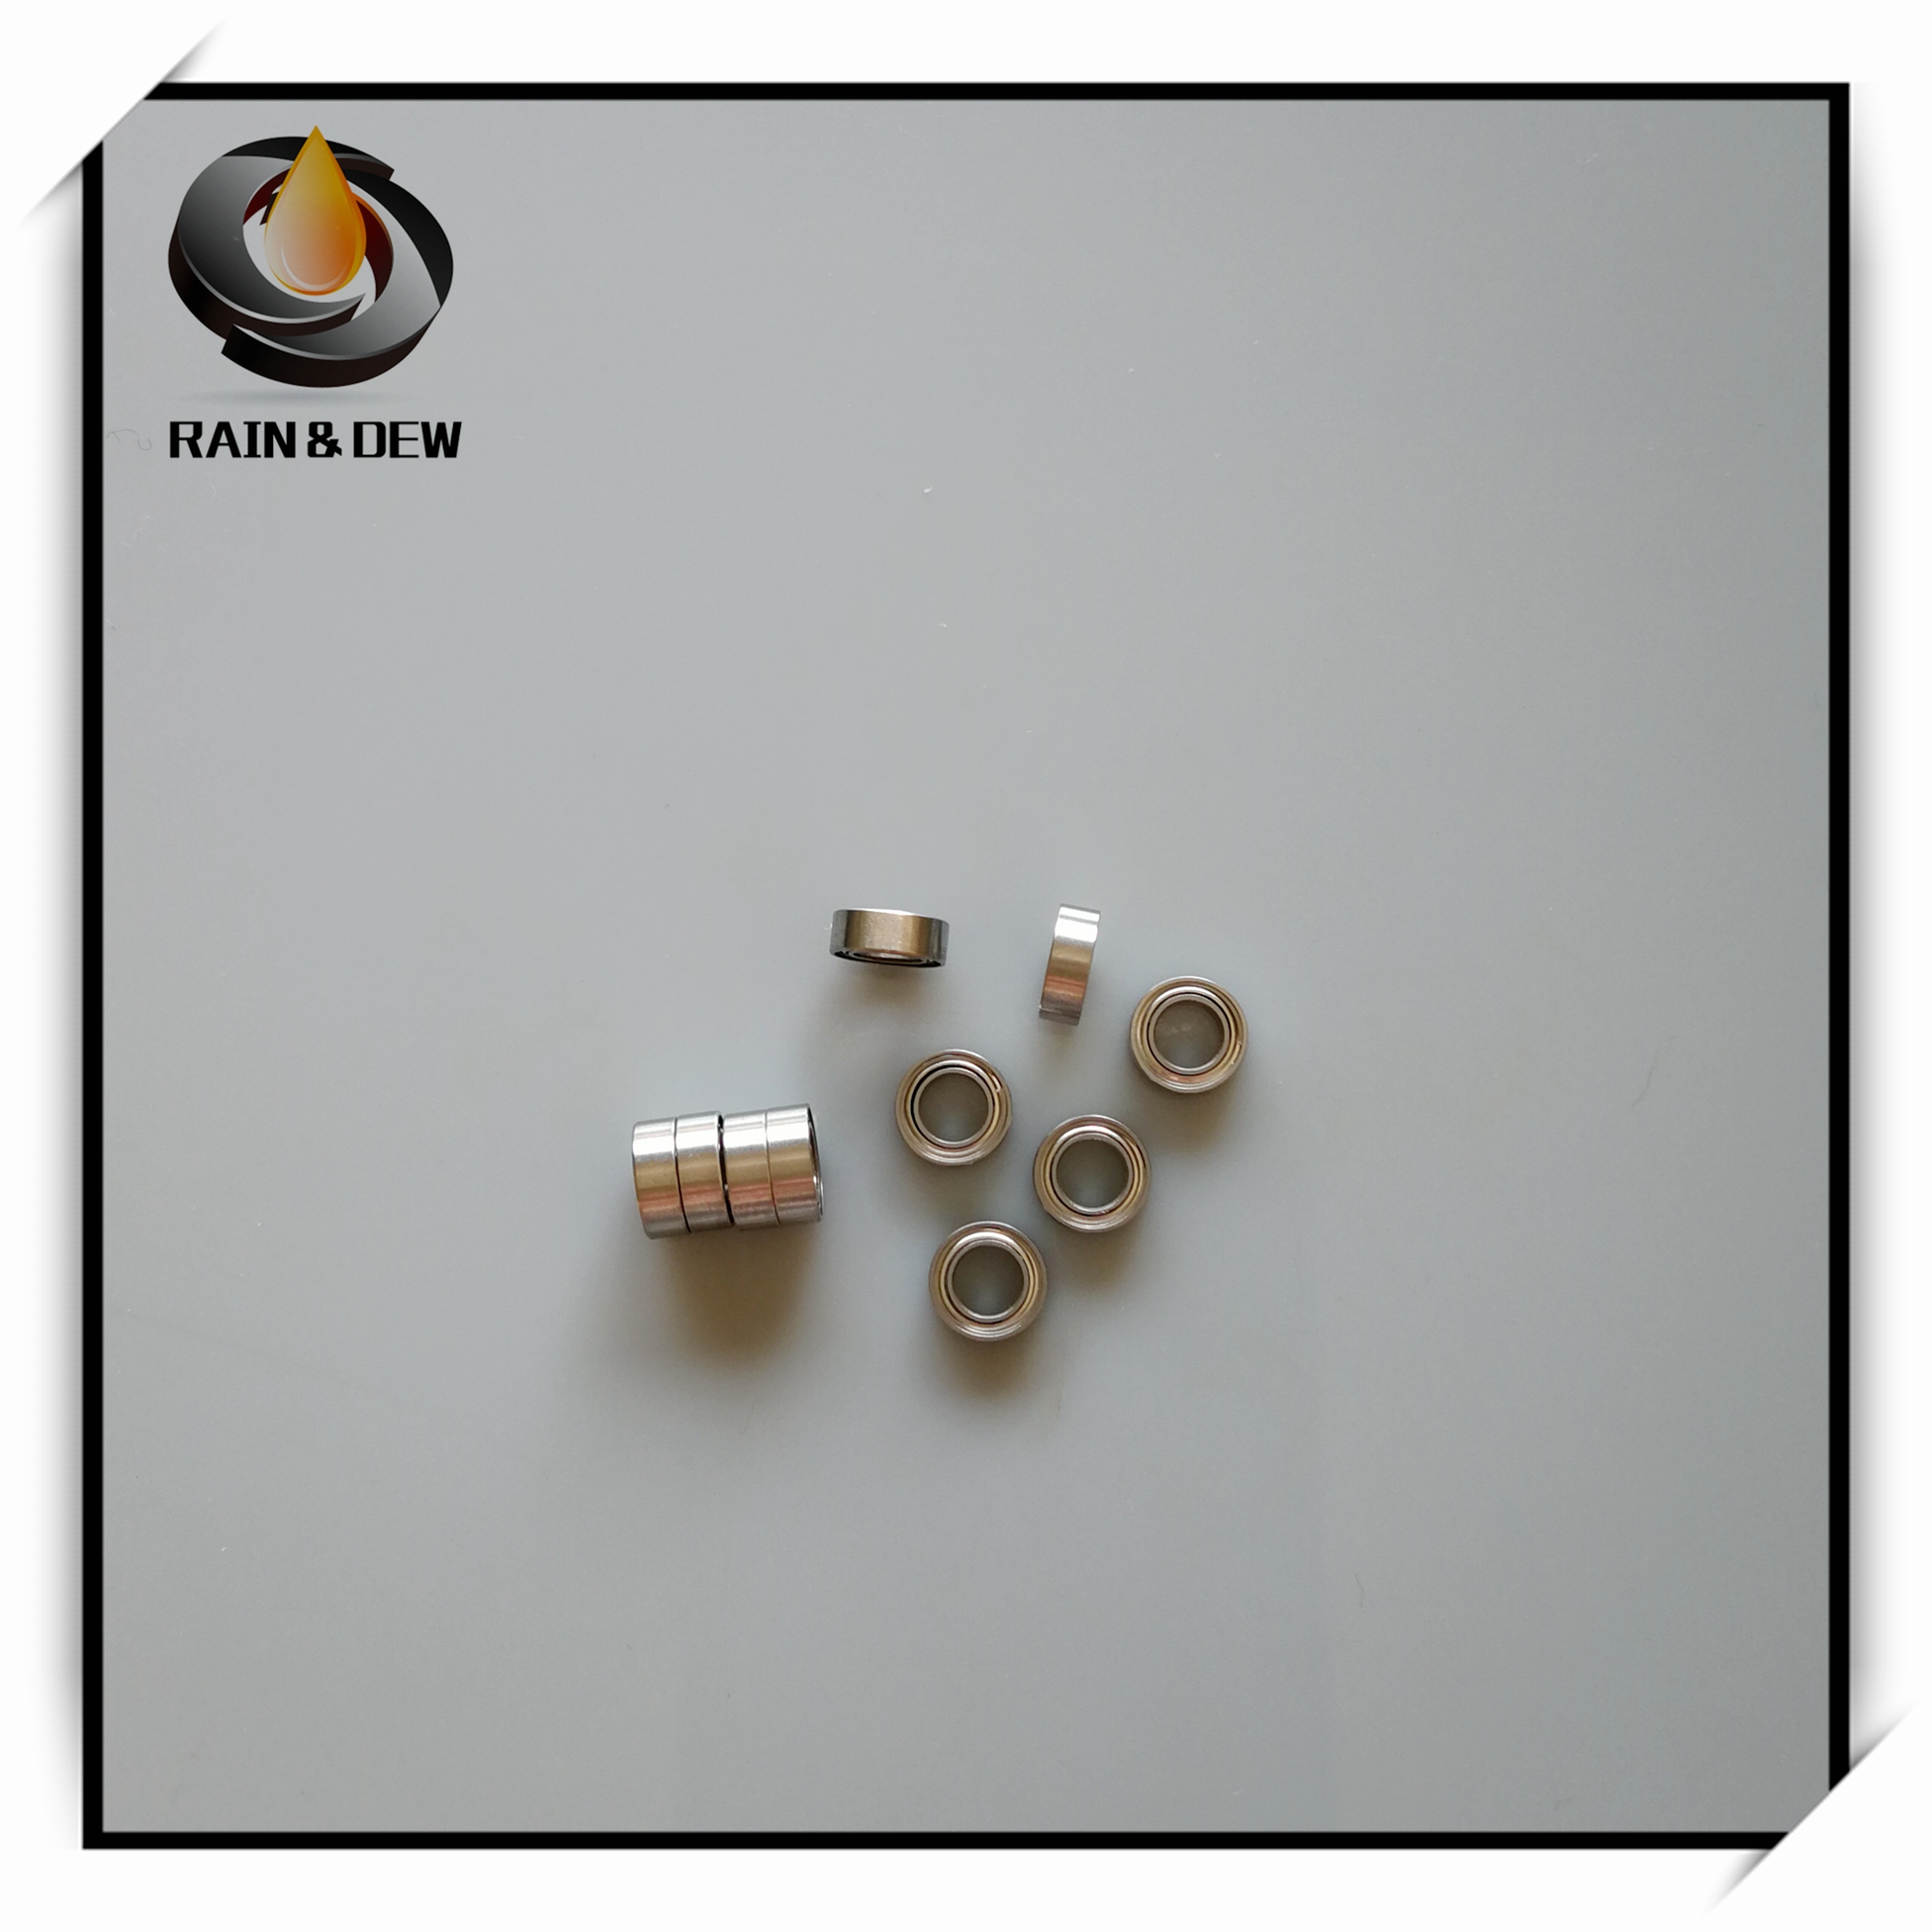 10Pcs SMR63ZZ Stainless Steel Ball Bearing ABEC-7  3*6*2.5 Mm Miniature MR63 ZZ Ball Bearings L630ZZ MR63Z